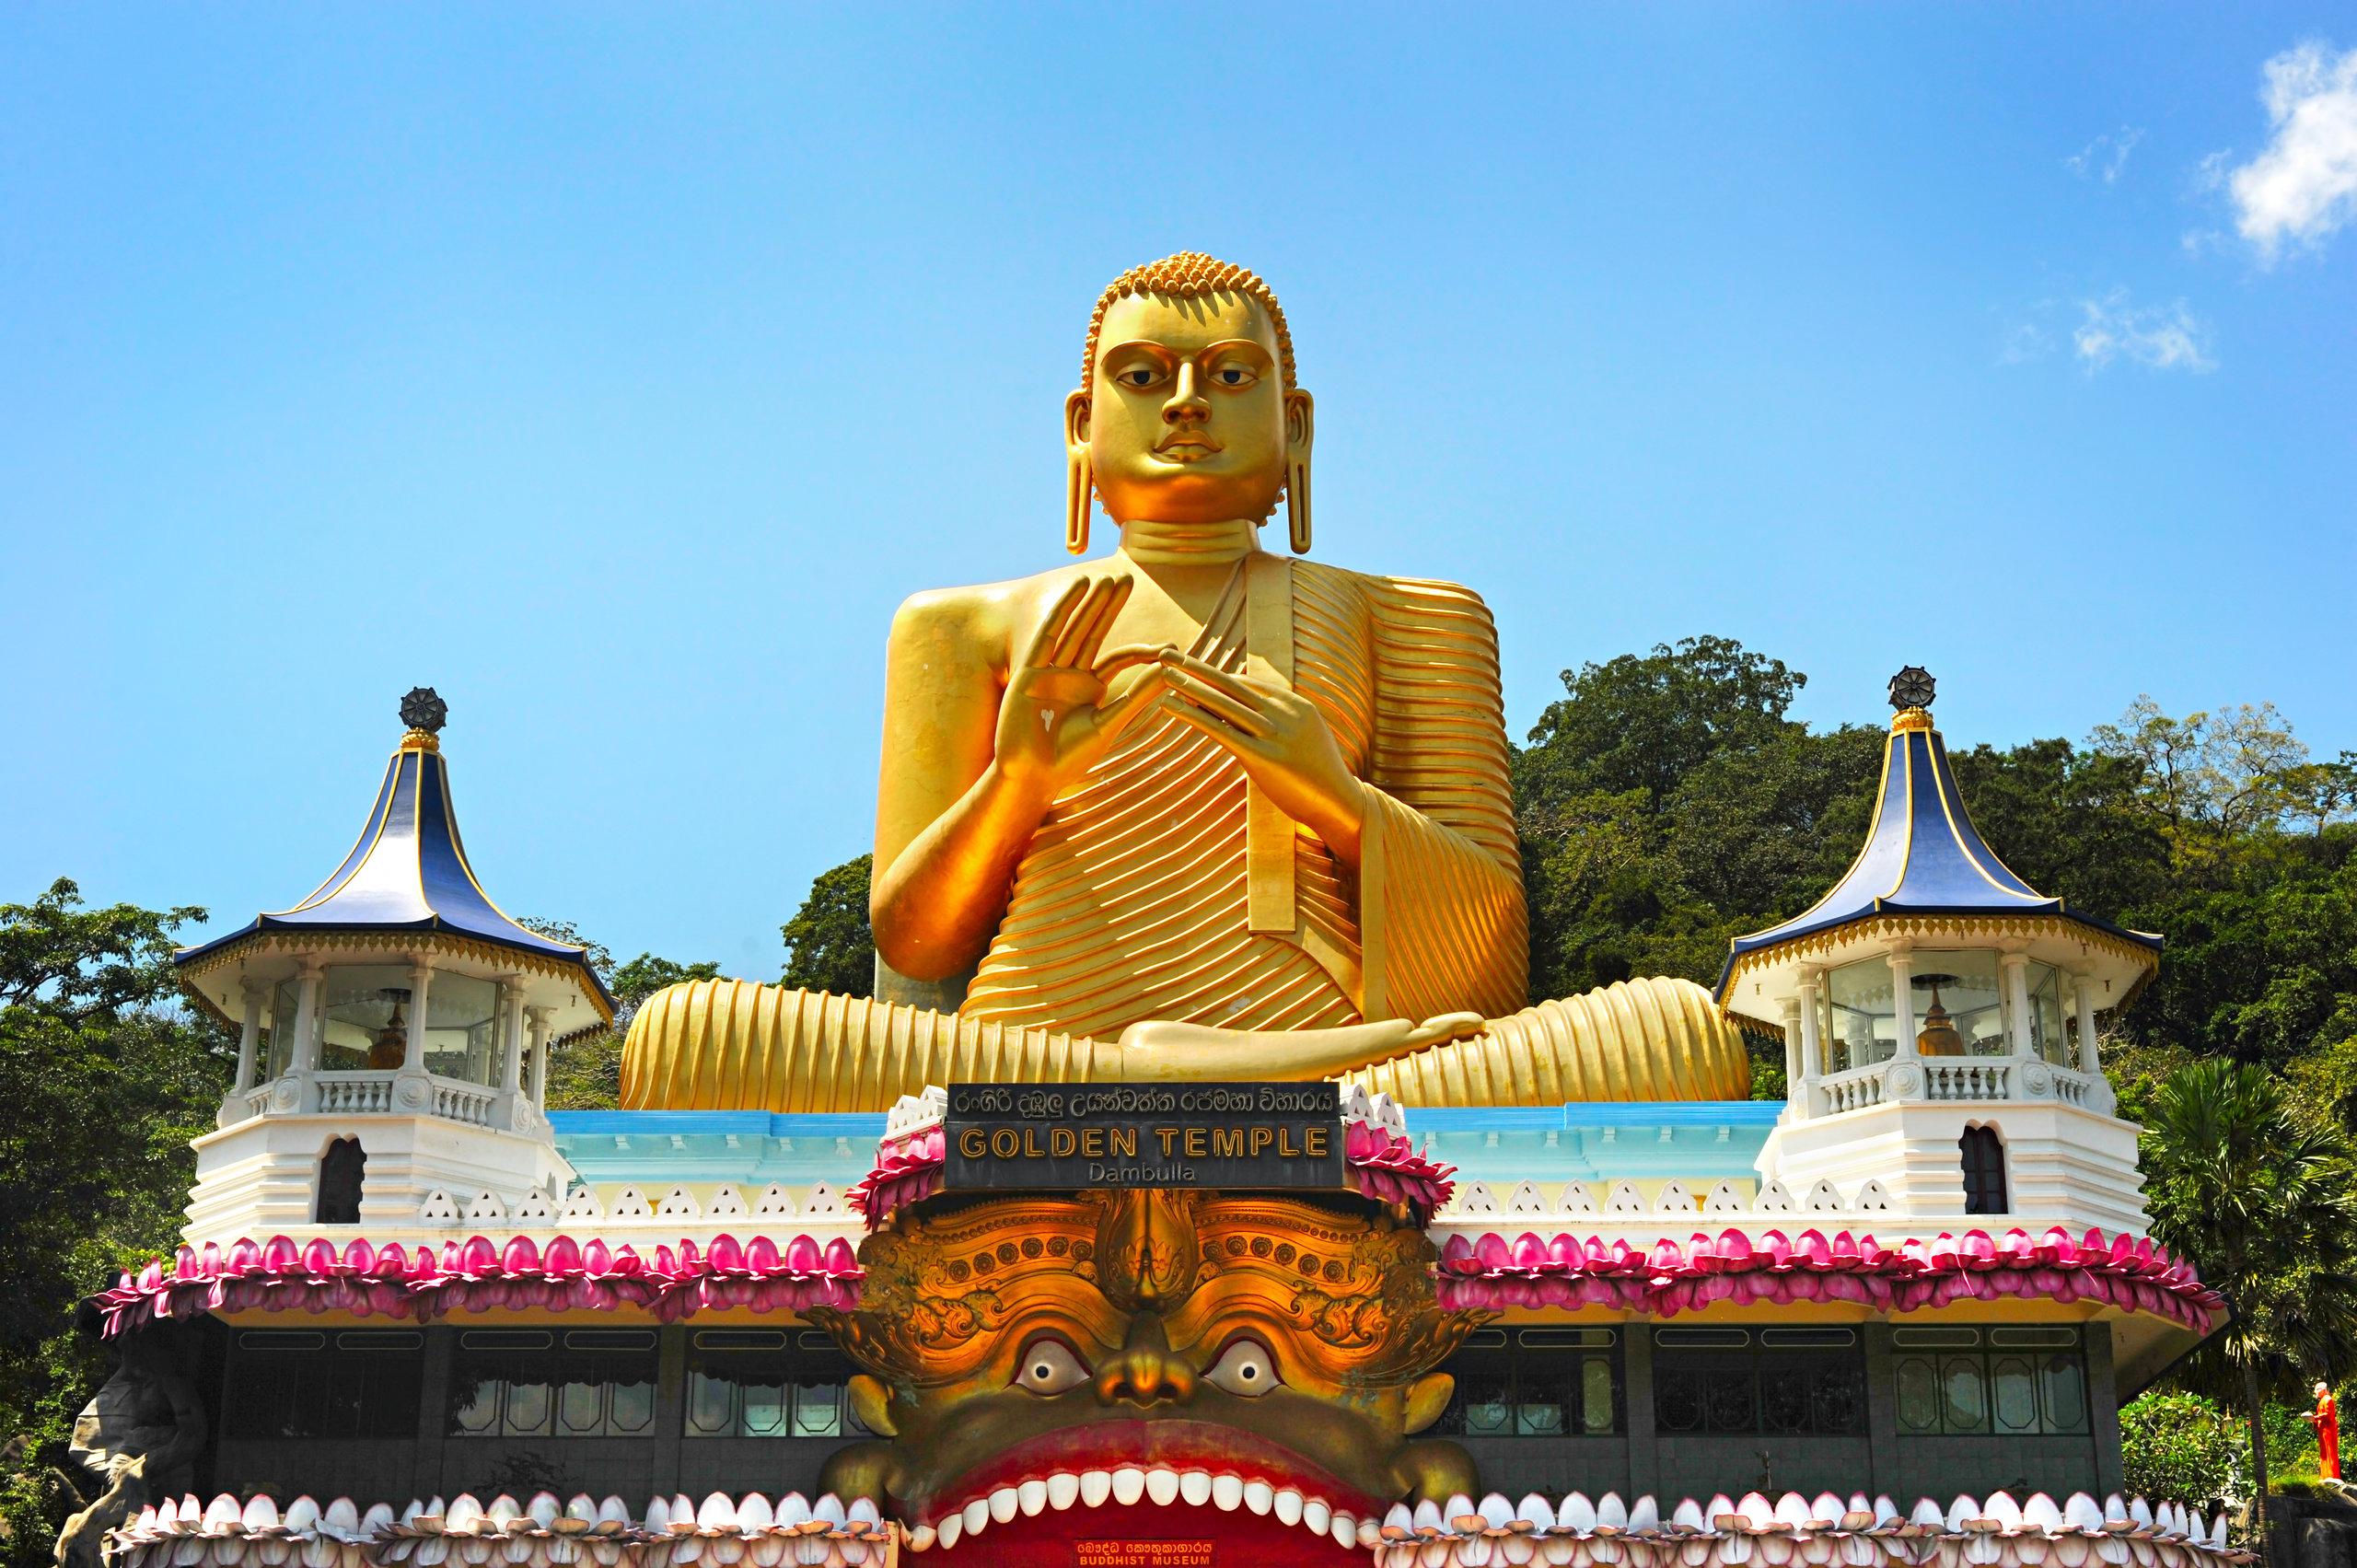 På en rejse til Sri Lanka ser du den gyldne Buddha ved huletemplet Dambulla